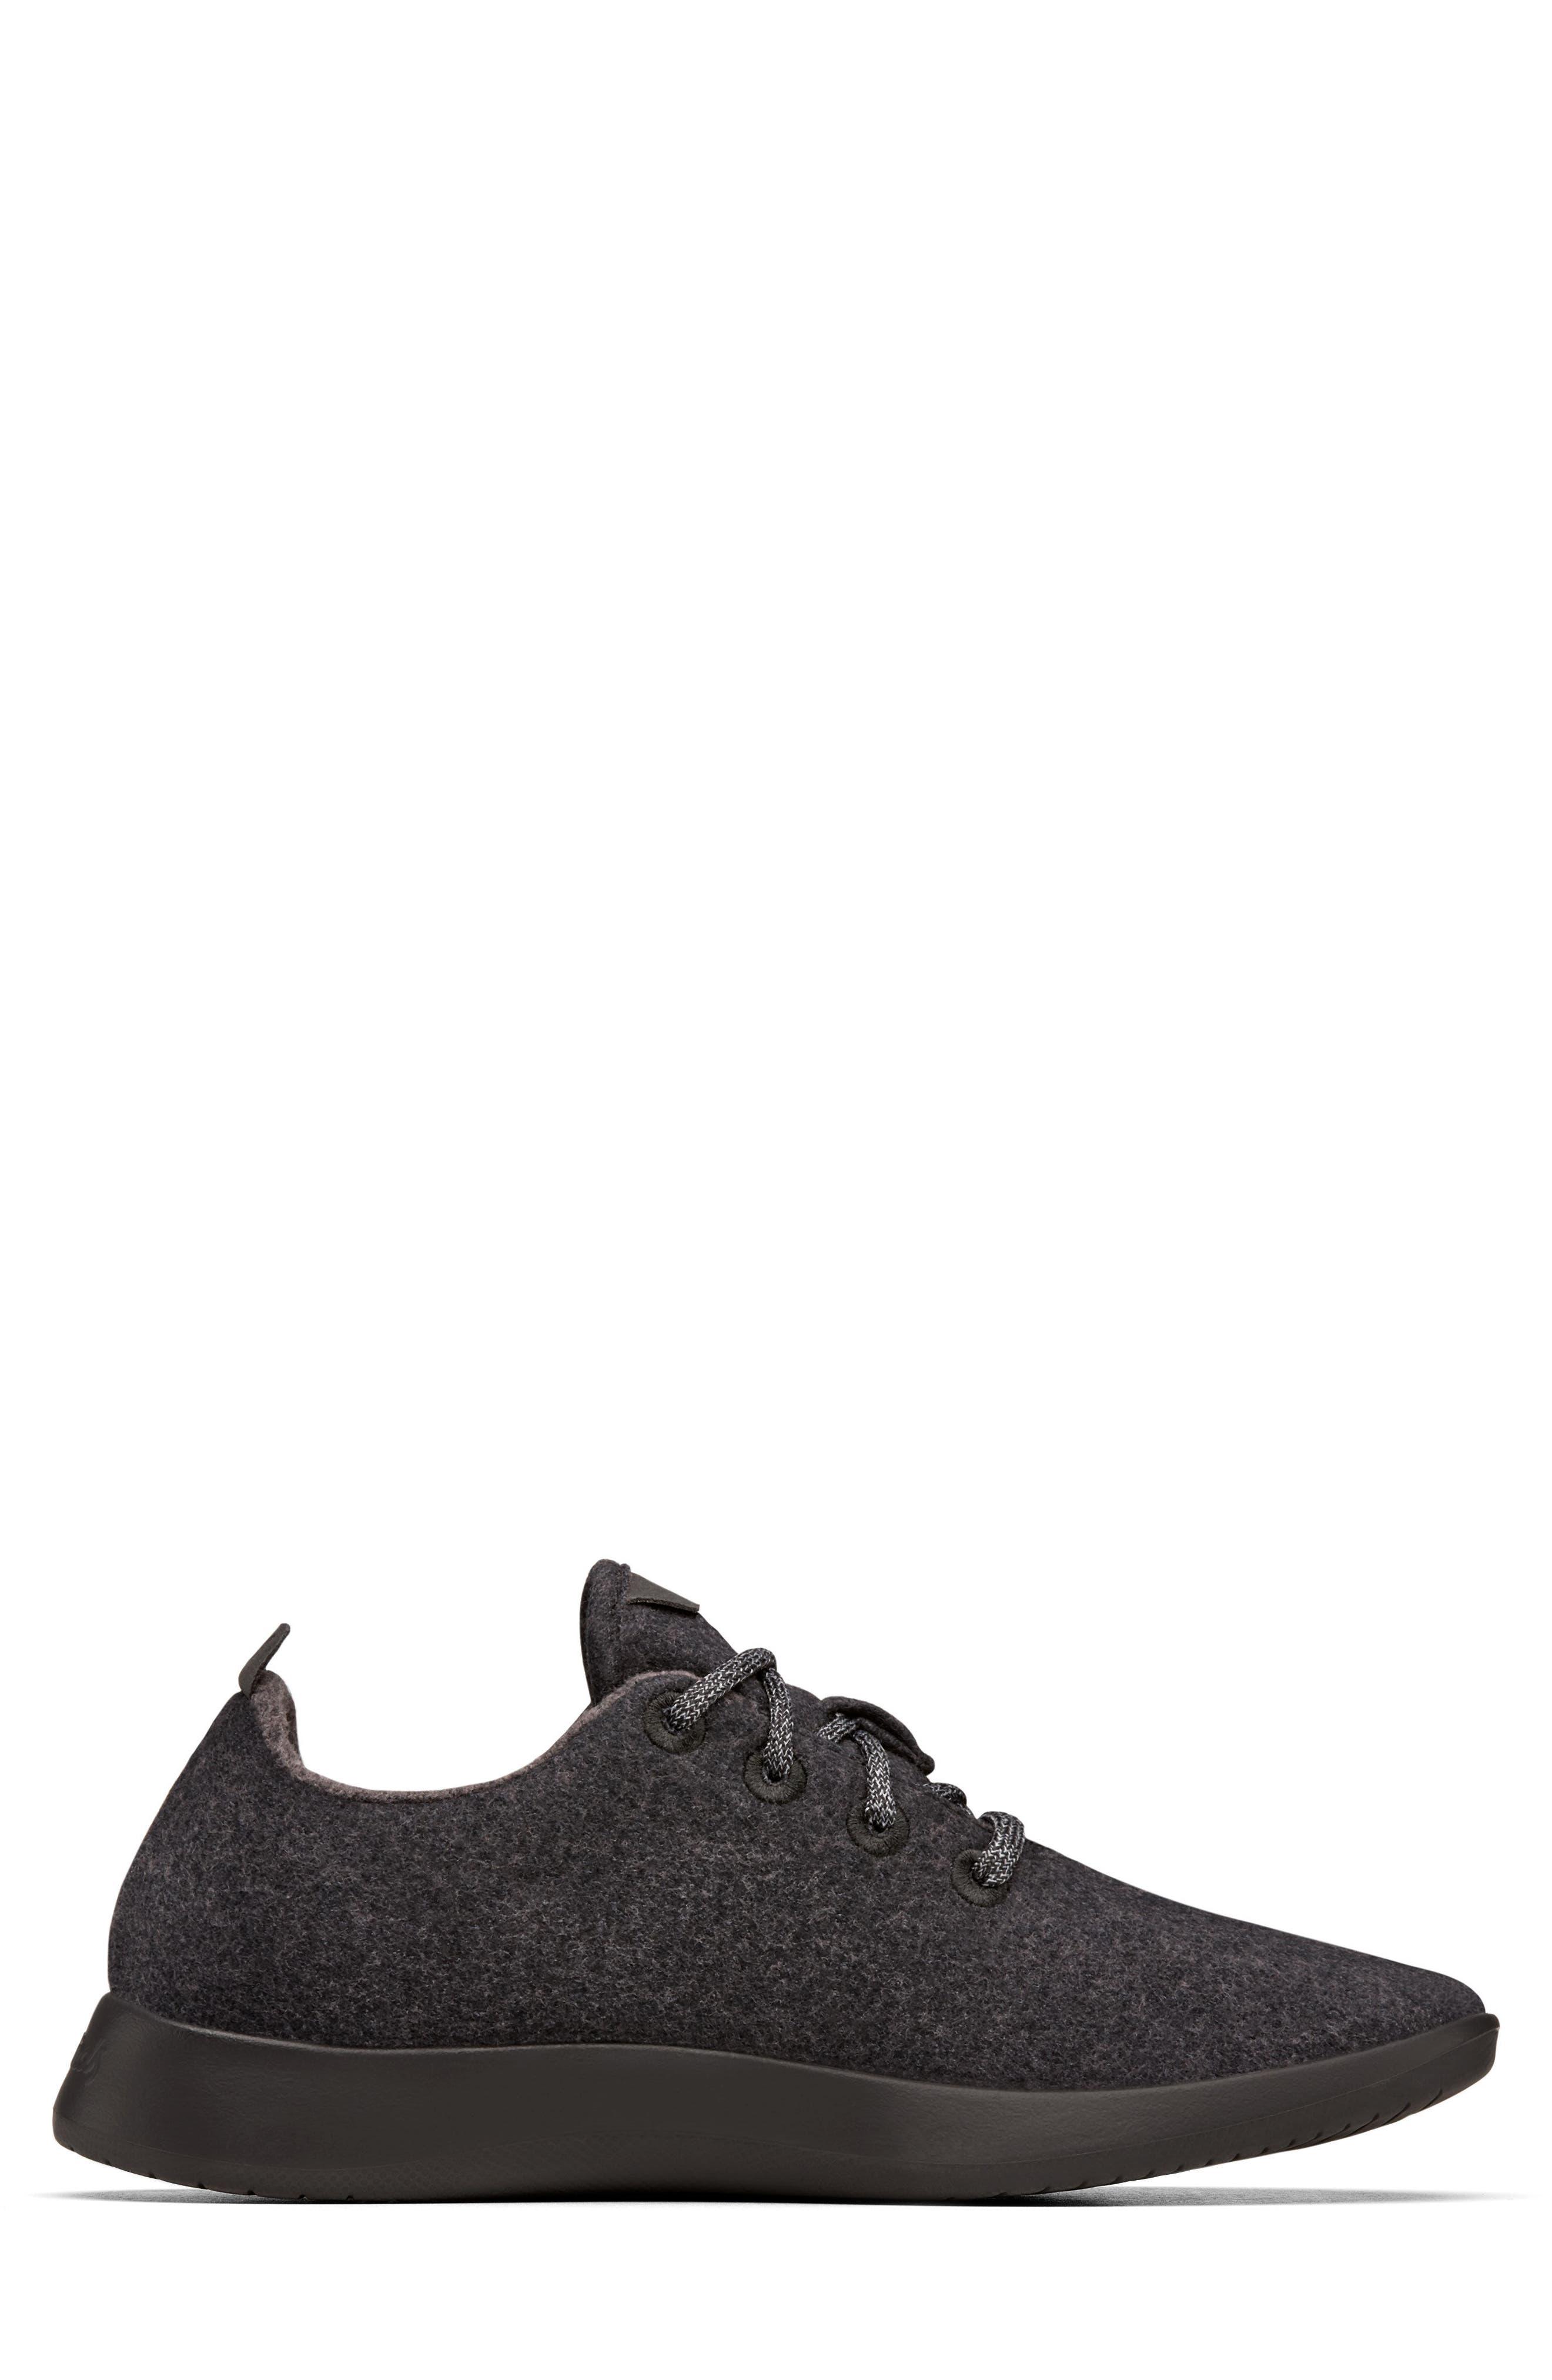 Wool Runner,                             Alternate thumbnail 2, color,                             Natural Black